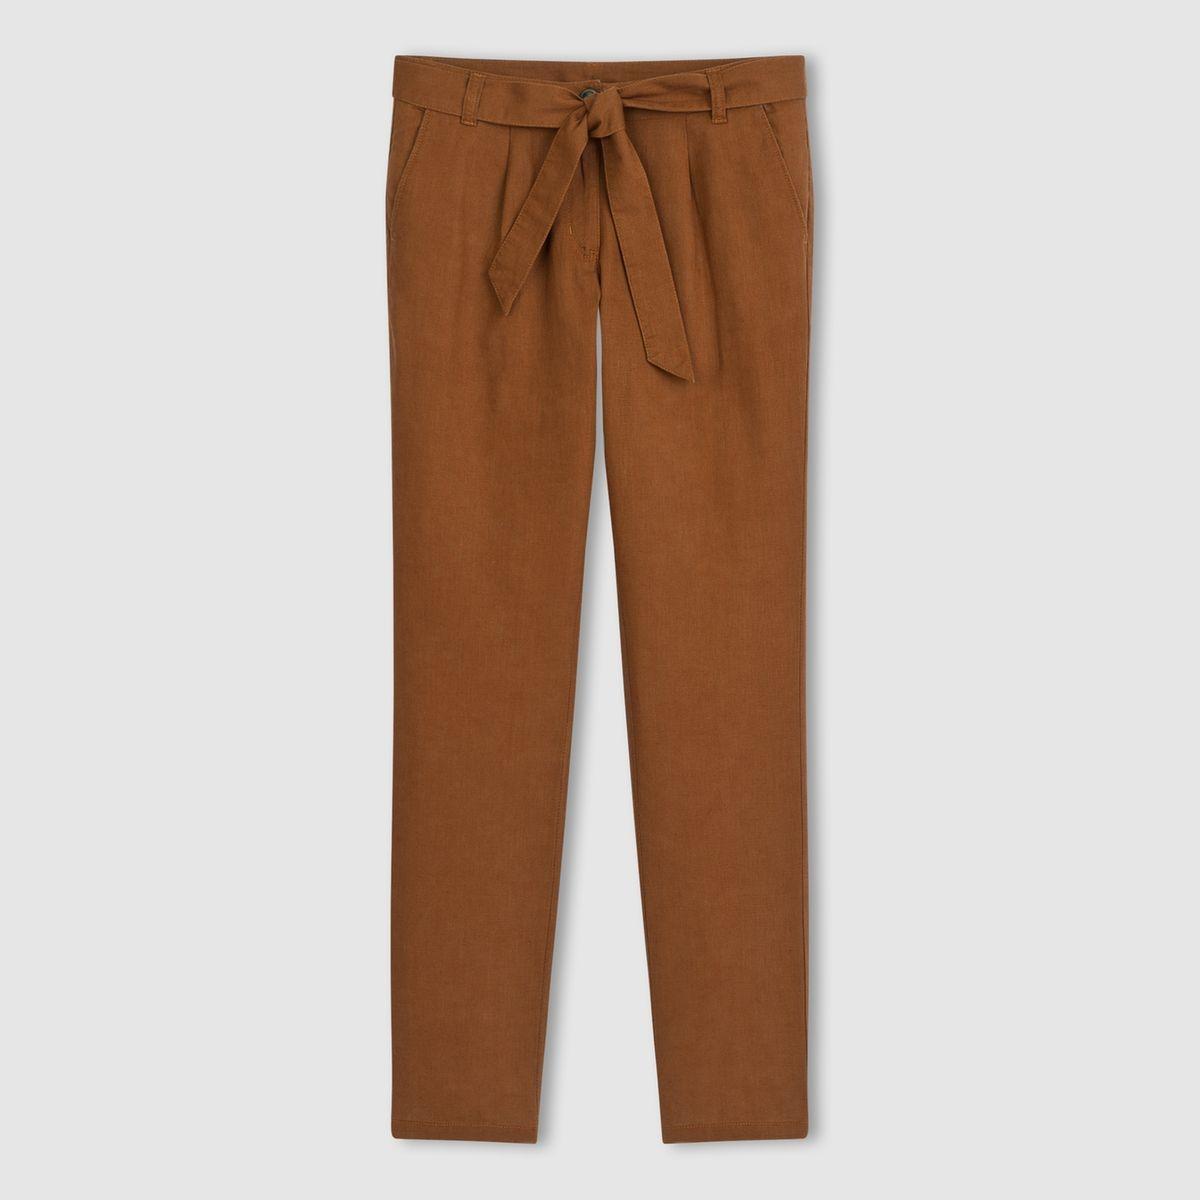 Pantalon 7/8ème lin/coton